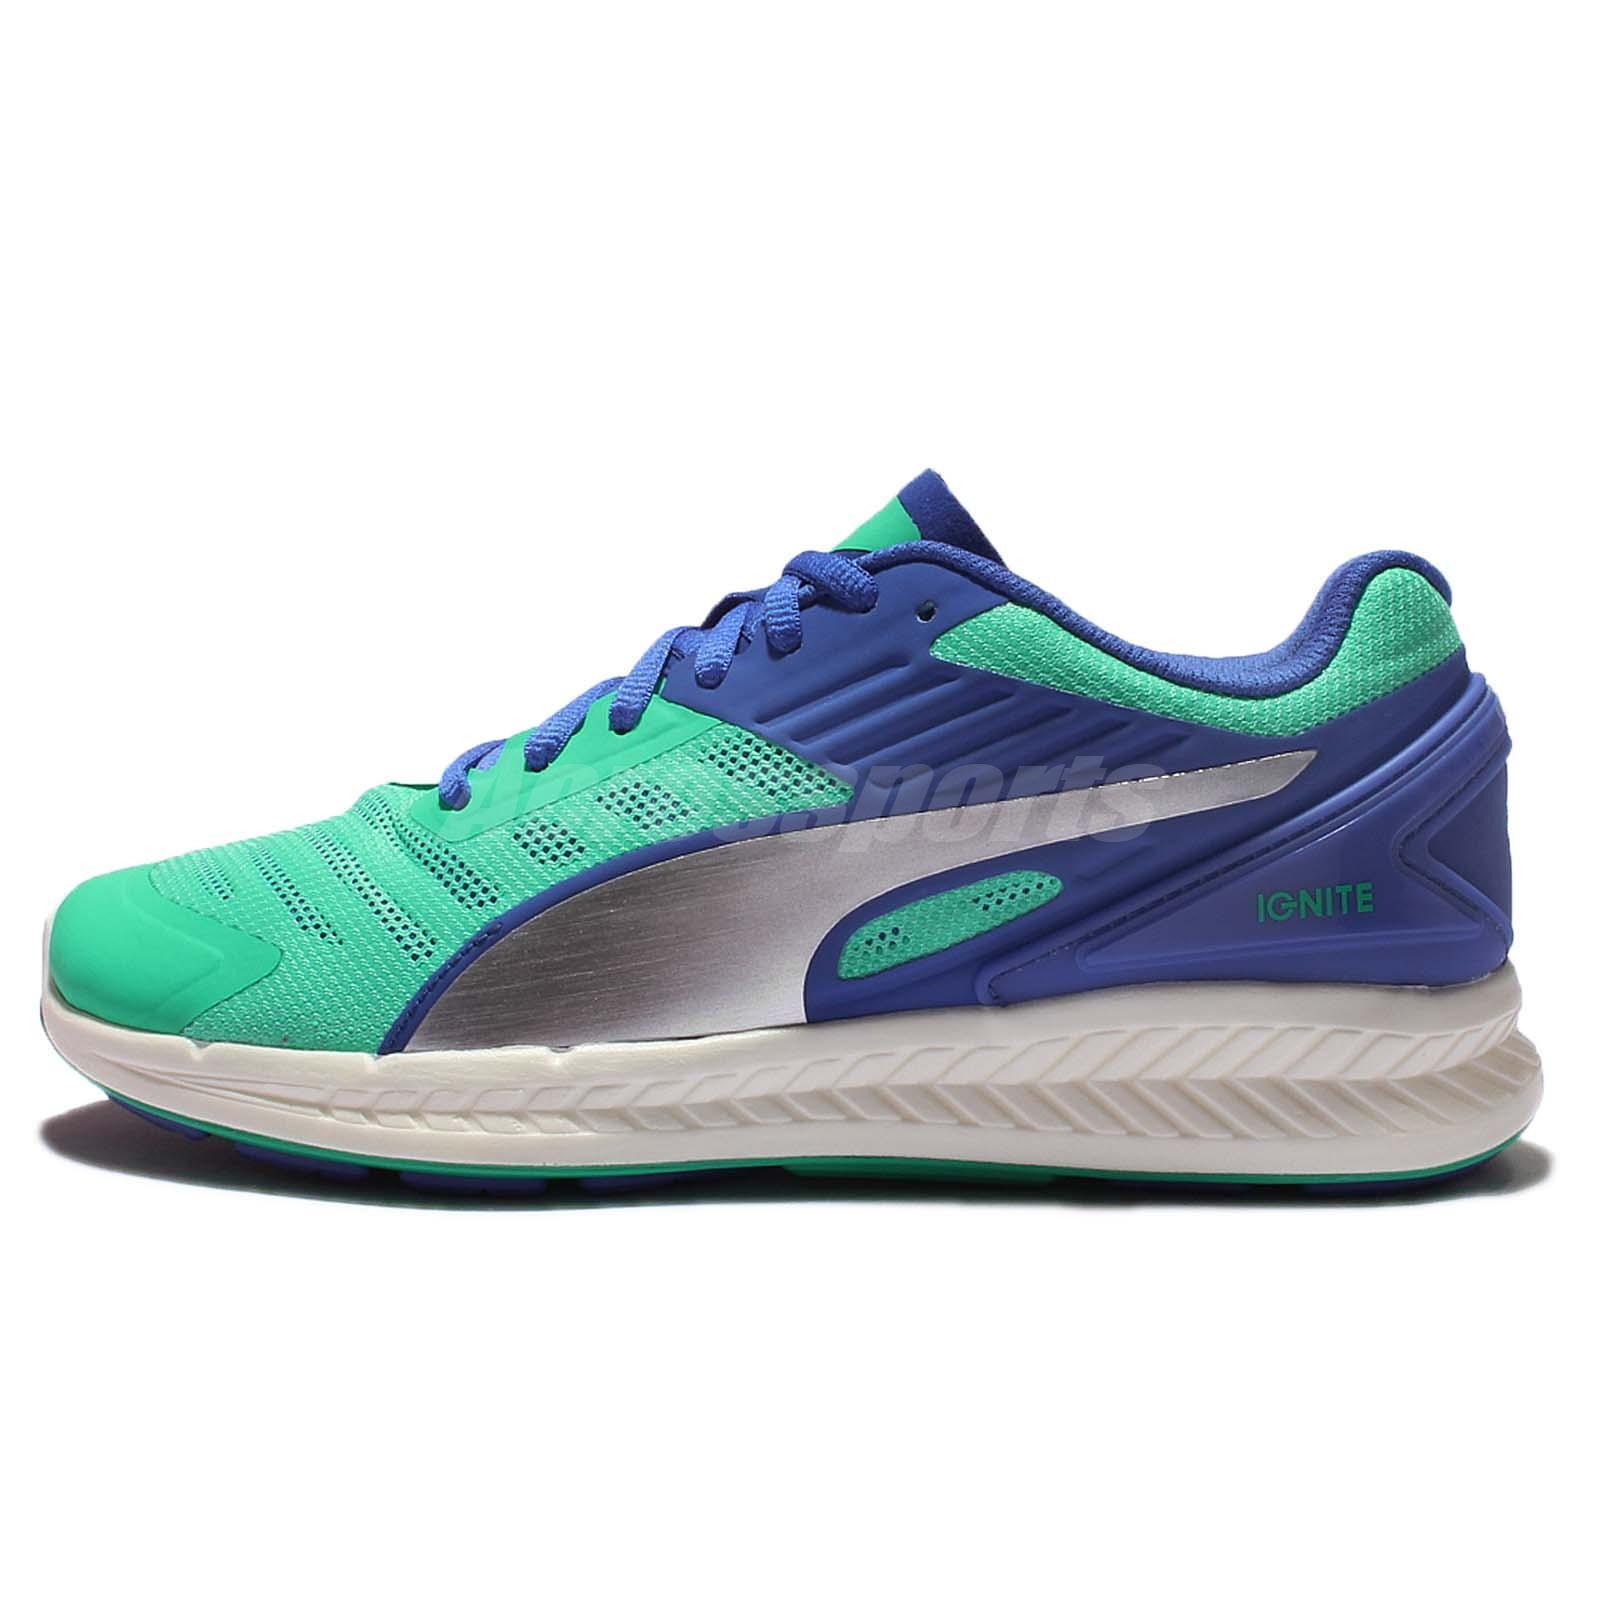 Puma Ignite V2 Mint Green Blue Womens Cushion Running Shoes 188612 04